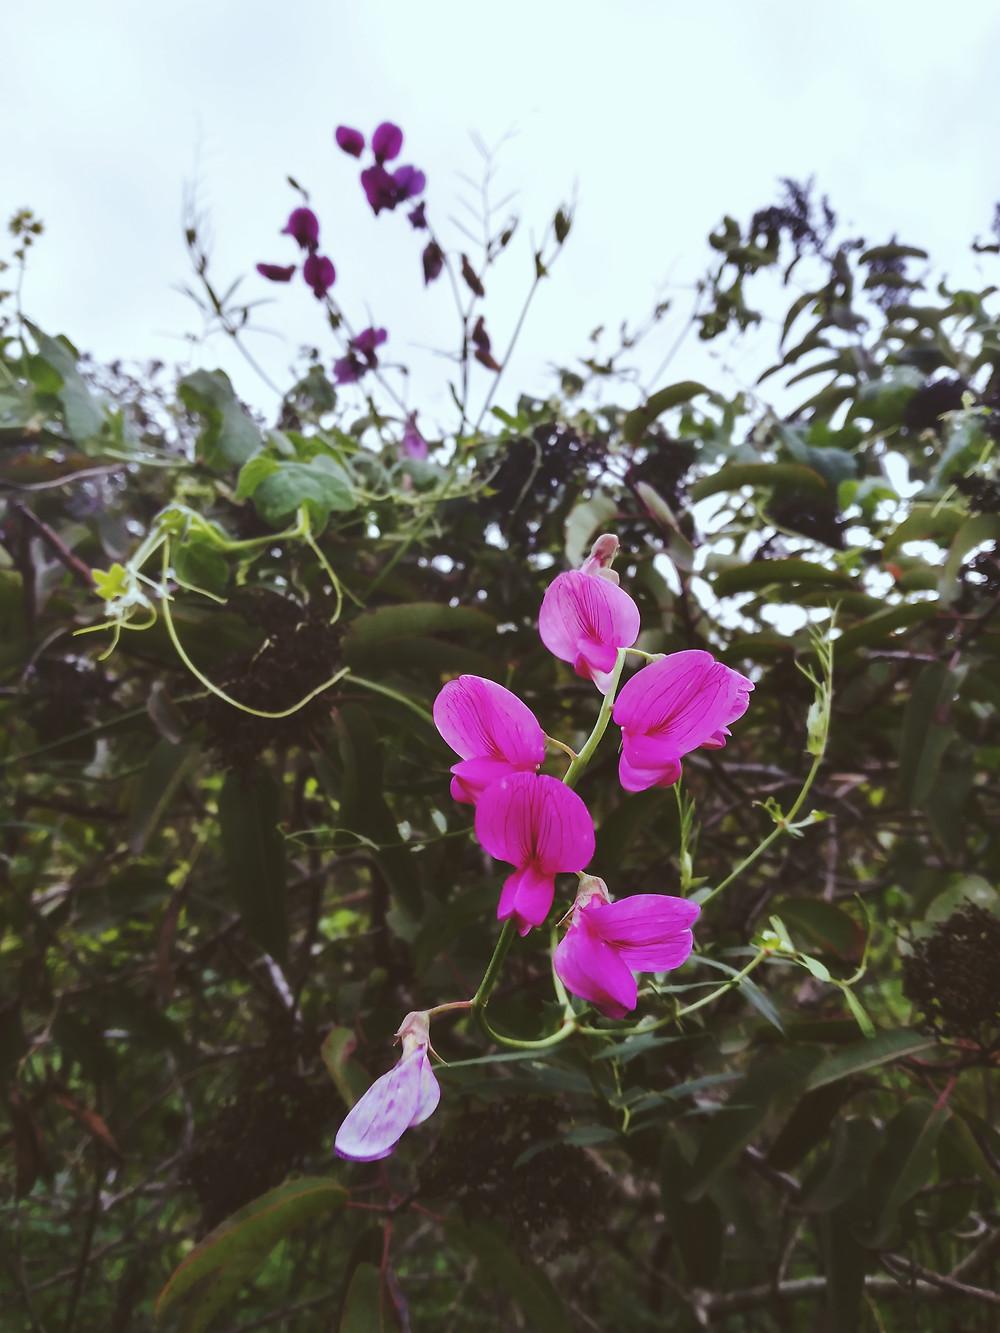 Art of Elura photography California Sweat Pea, pink and purple flowers